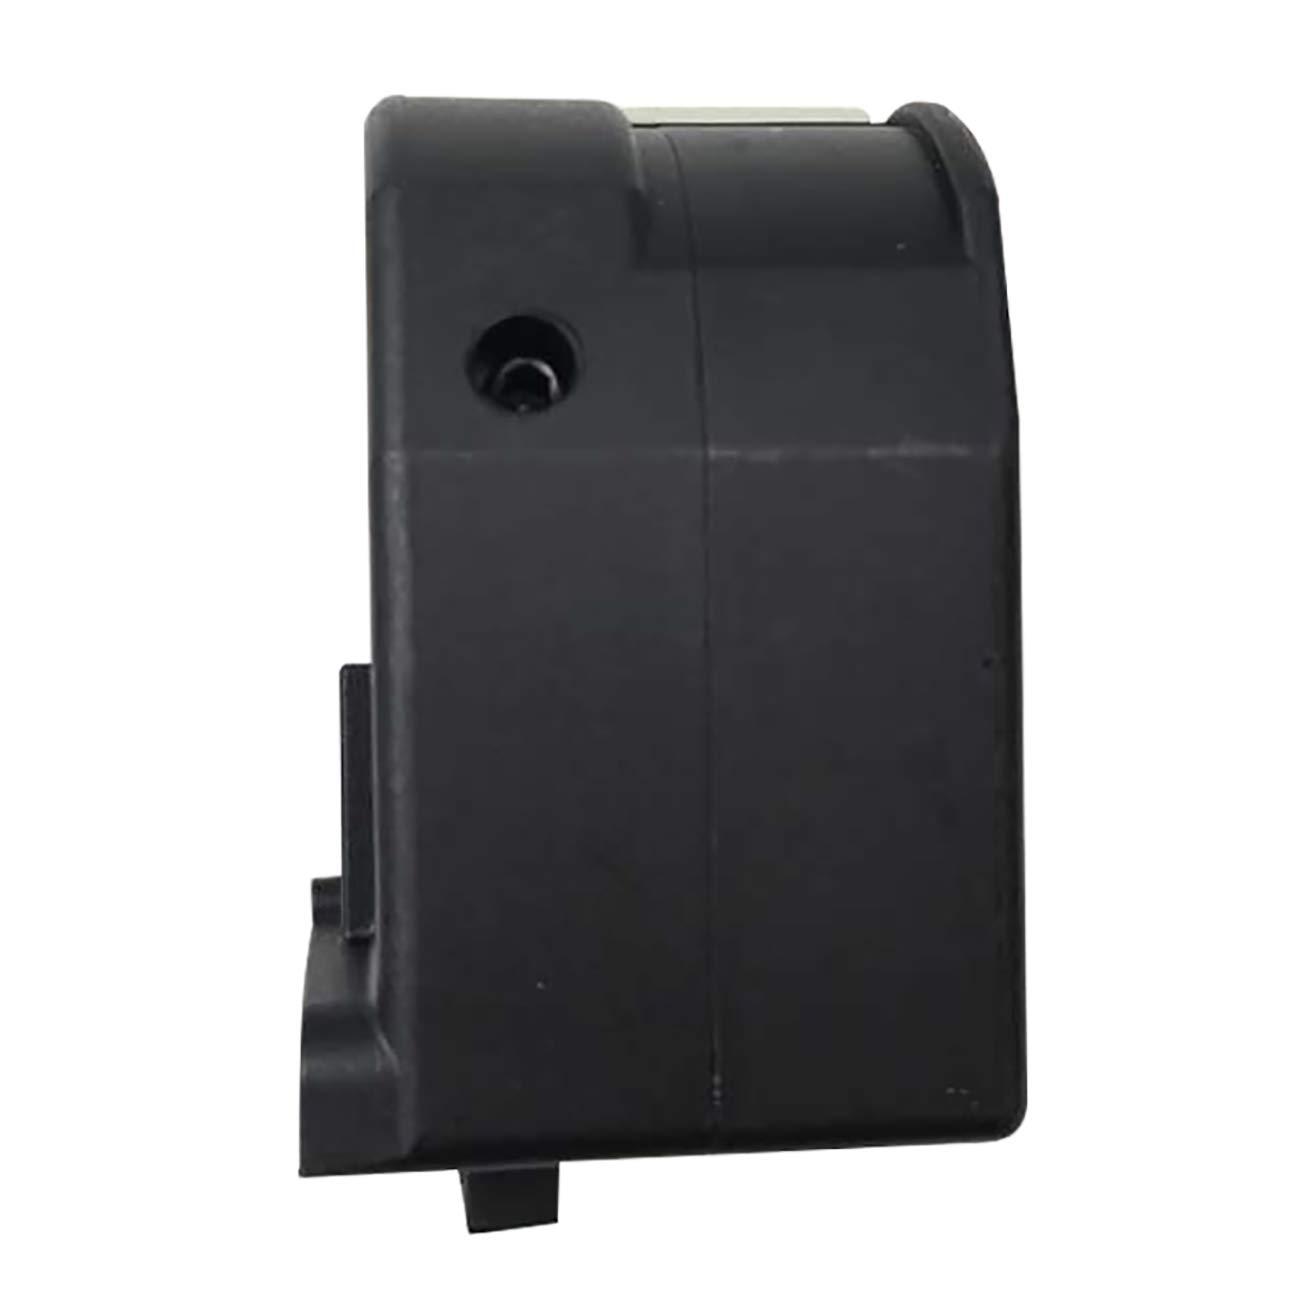 Mati Left Handlebar Switch Assembly for Polaris 4011835 4010591 4010560 2010340 4010592 4011385